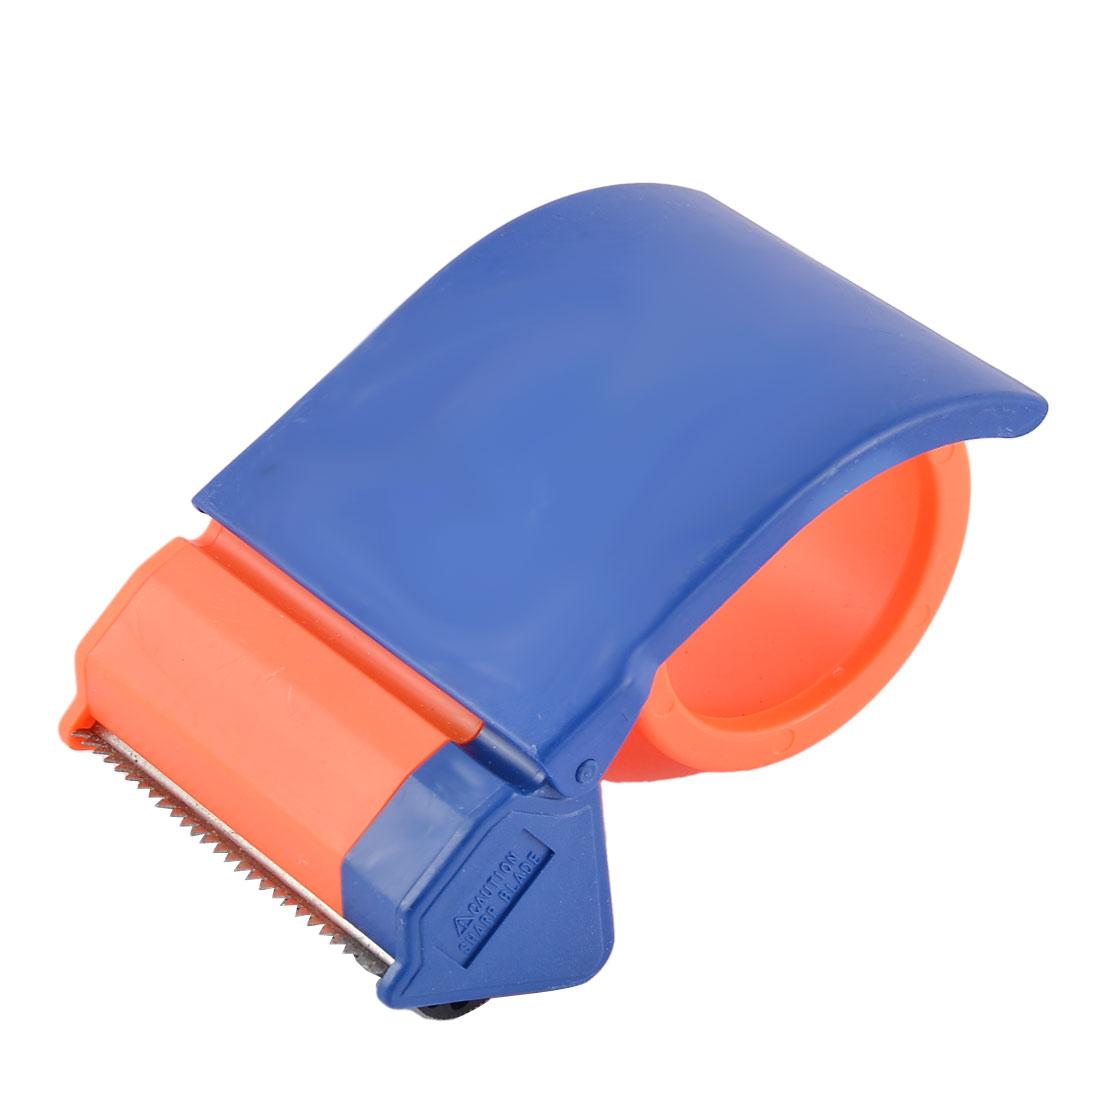 School Office Plastic Sealing Packaging Tape Dispenser Blue Orange 3-inches Wide